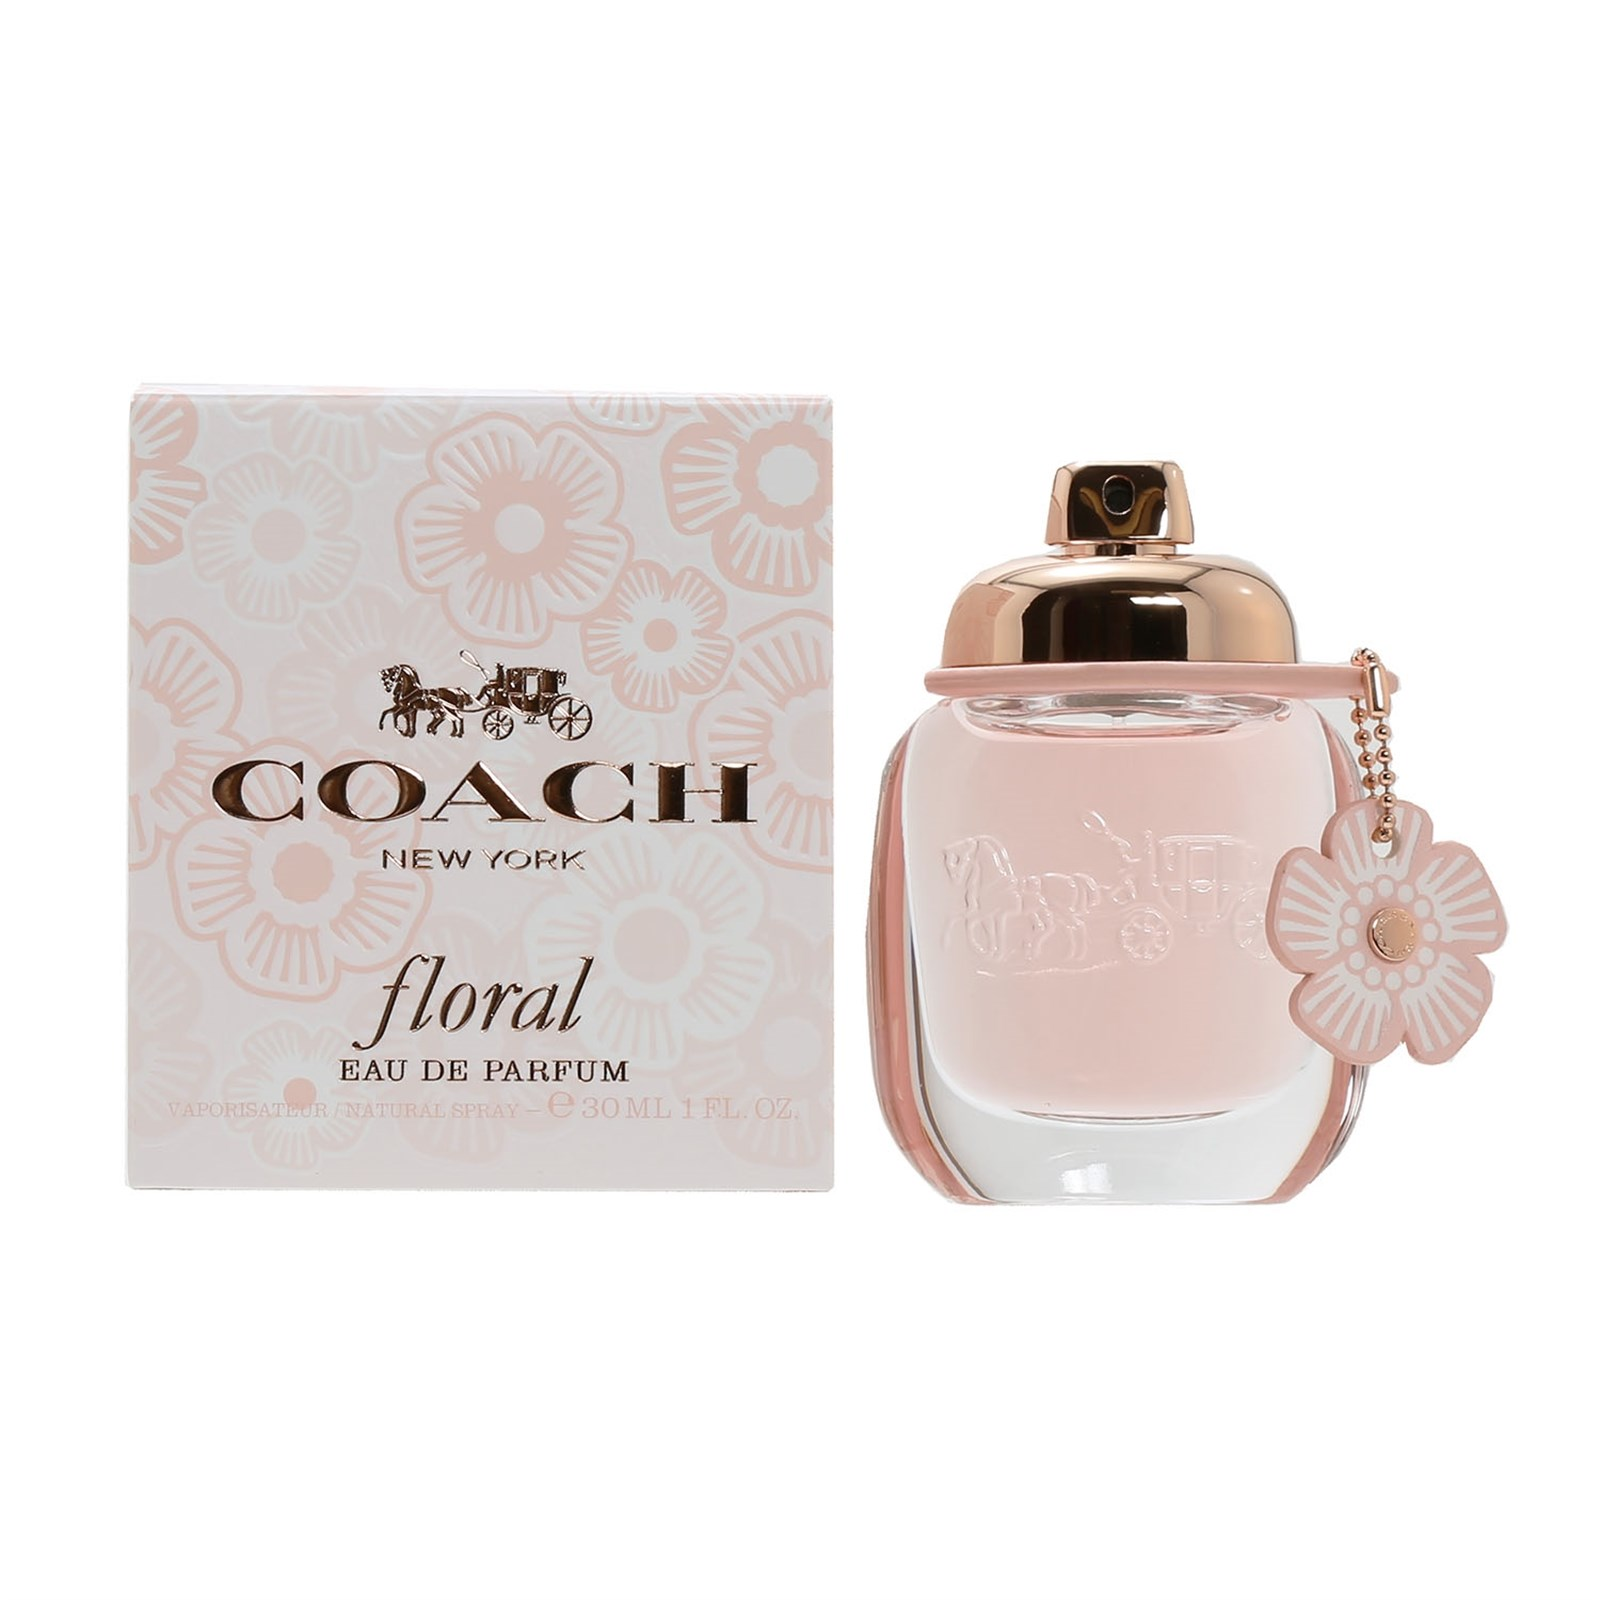 Coach Floral EDP 1oz. Perfume $29.99 Shipped (Was $62)